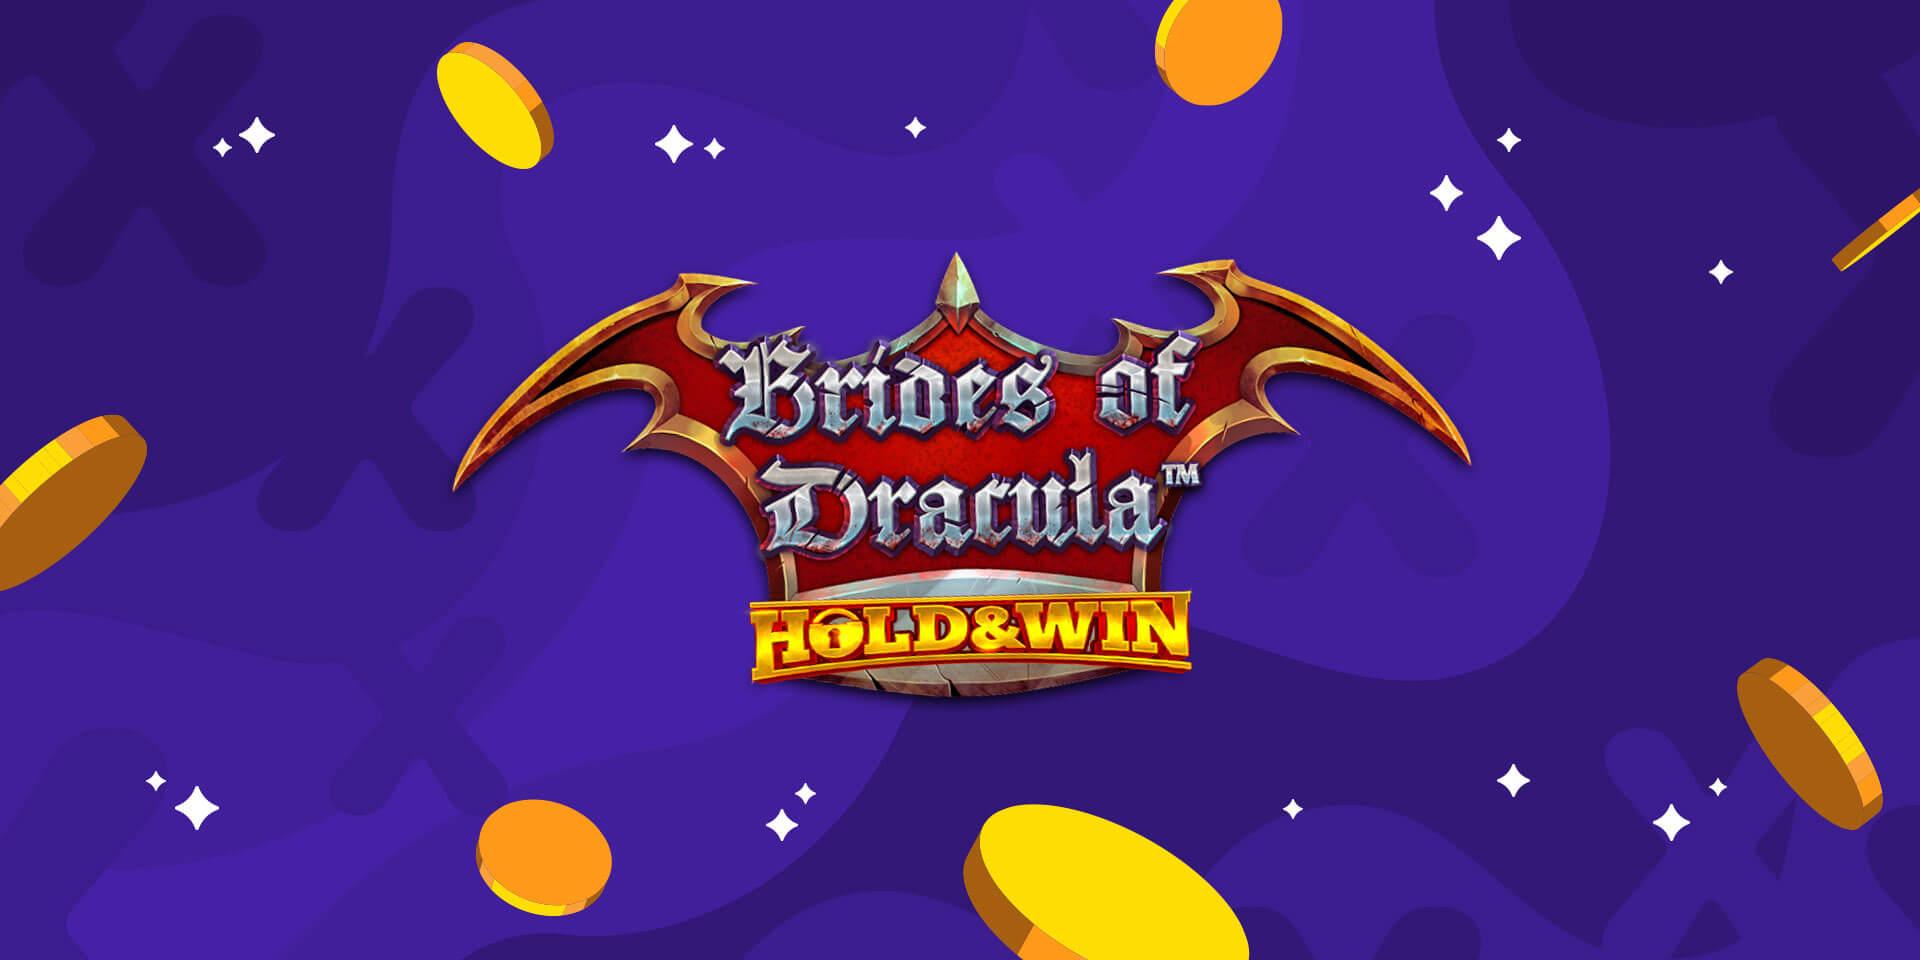 Brides of Dracula